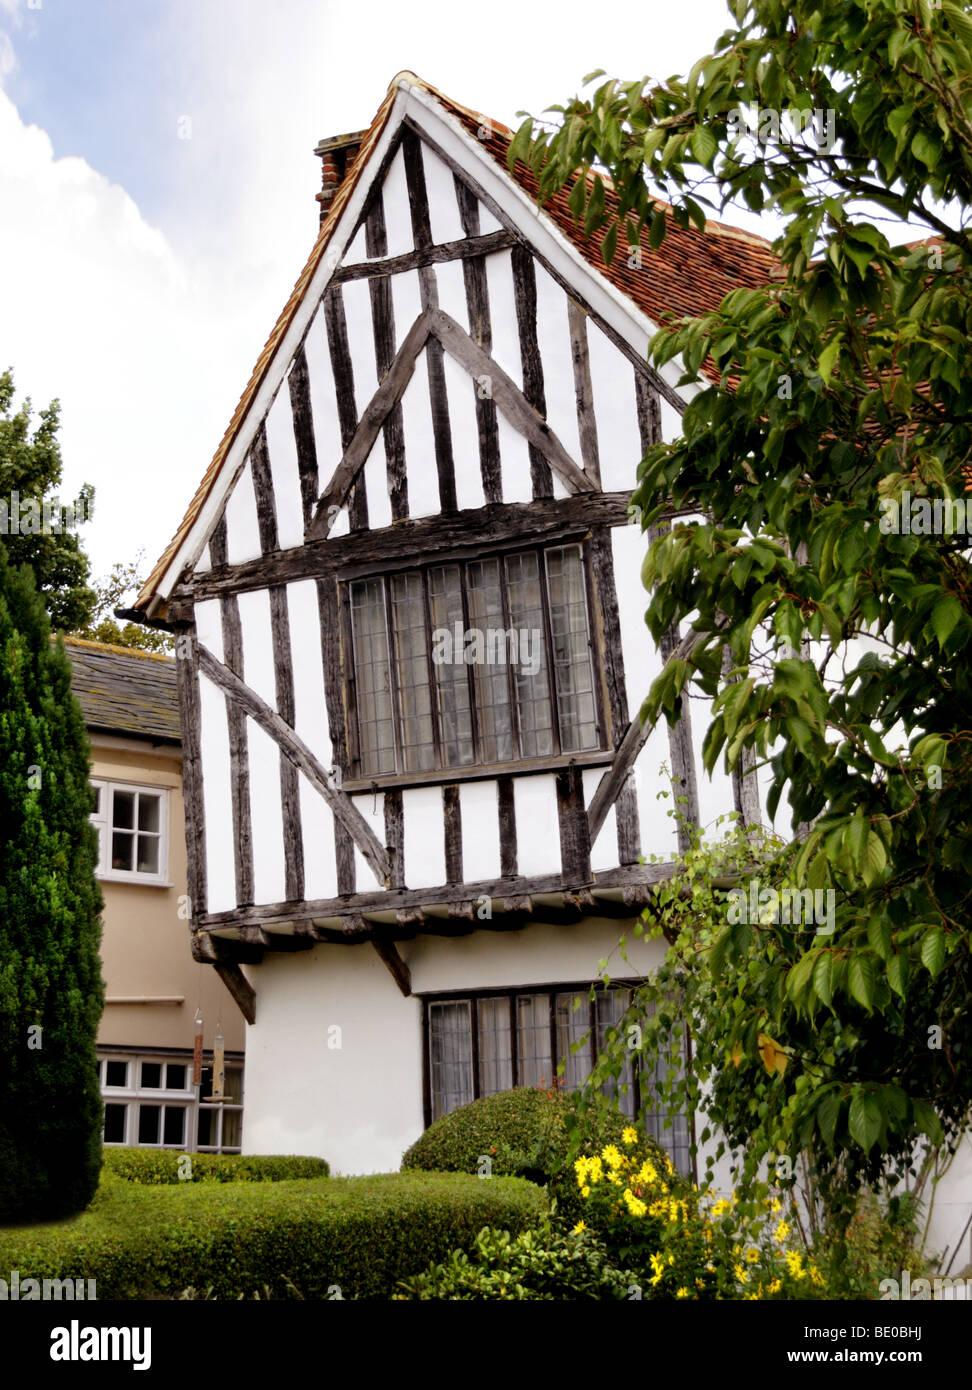 House in Lavenham, Suffolk, England - Stock Image